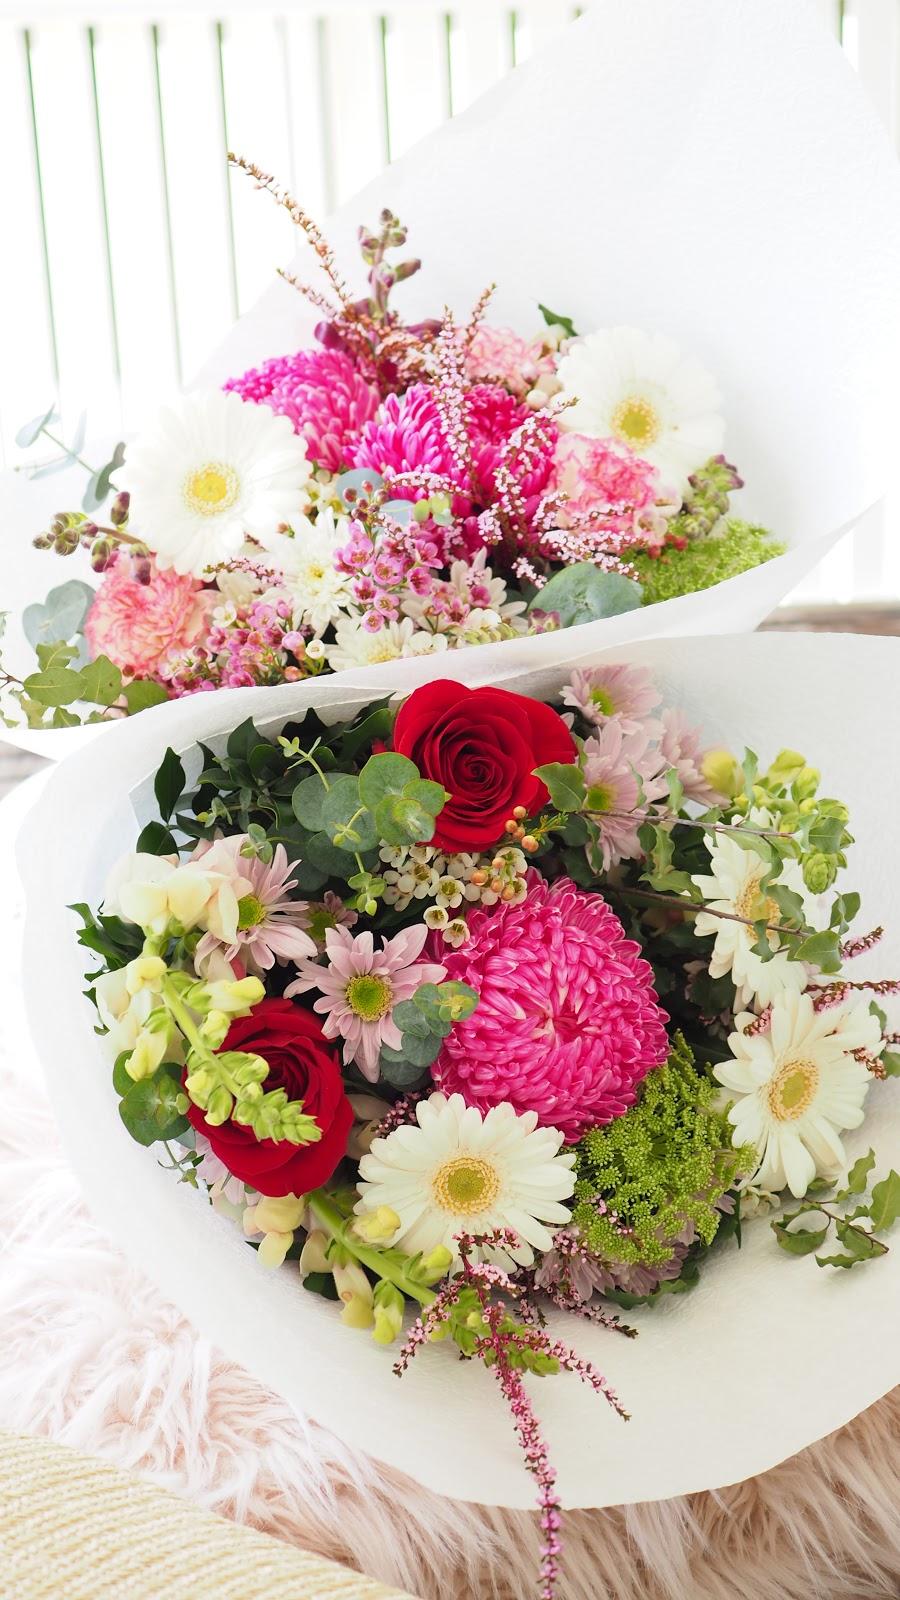 Seaside Blossoms -Online Florist- Wellington Point | florist | 215 Main Rd, Wellington Point QLD 4160, Australia | 0455100380 OR +61 455 100 380